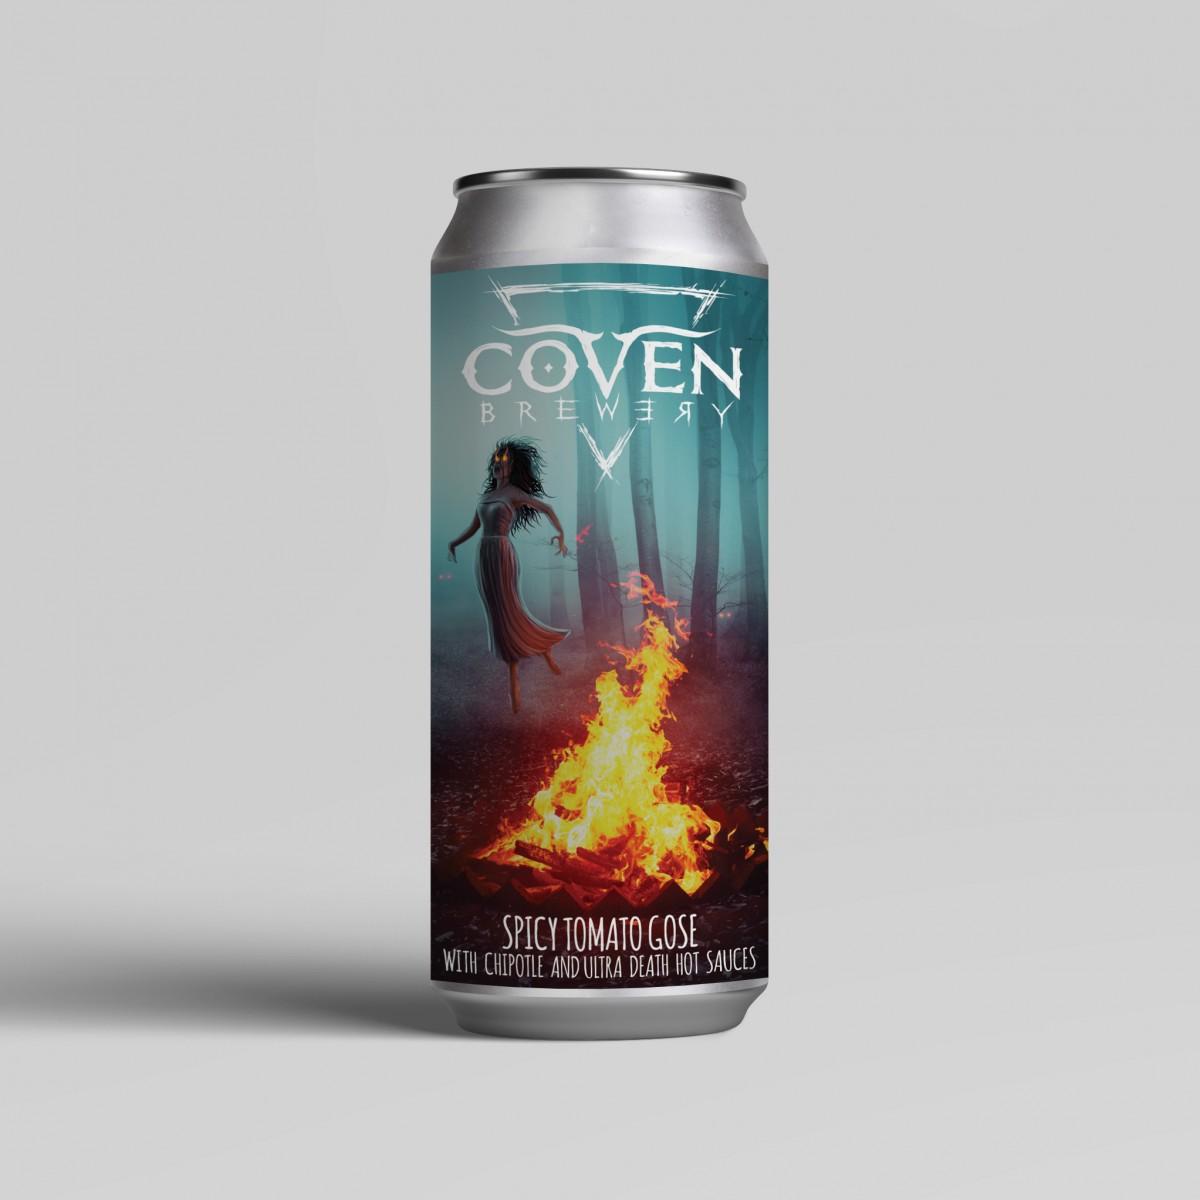 coven_art_Hell_awaits-0_5-new-1200x1200.